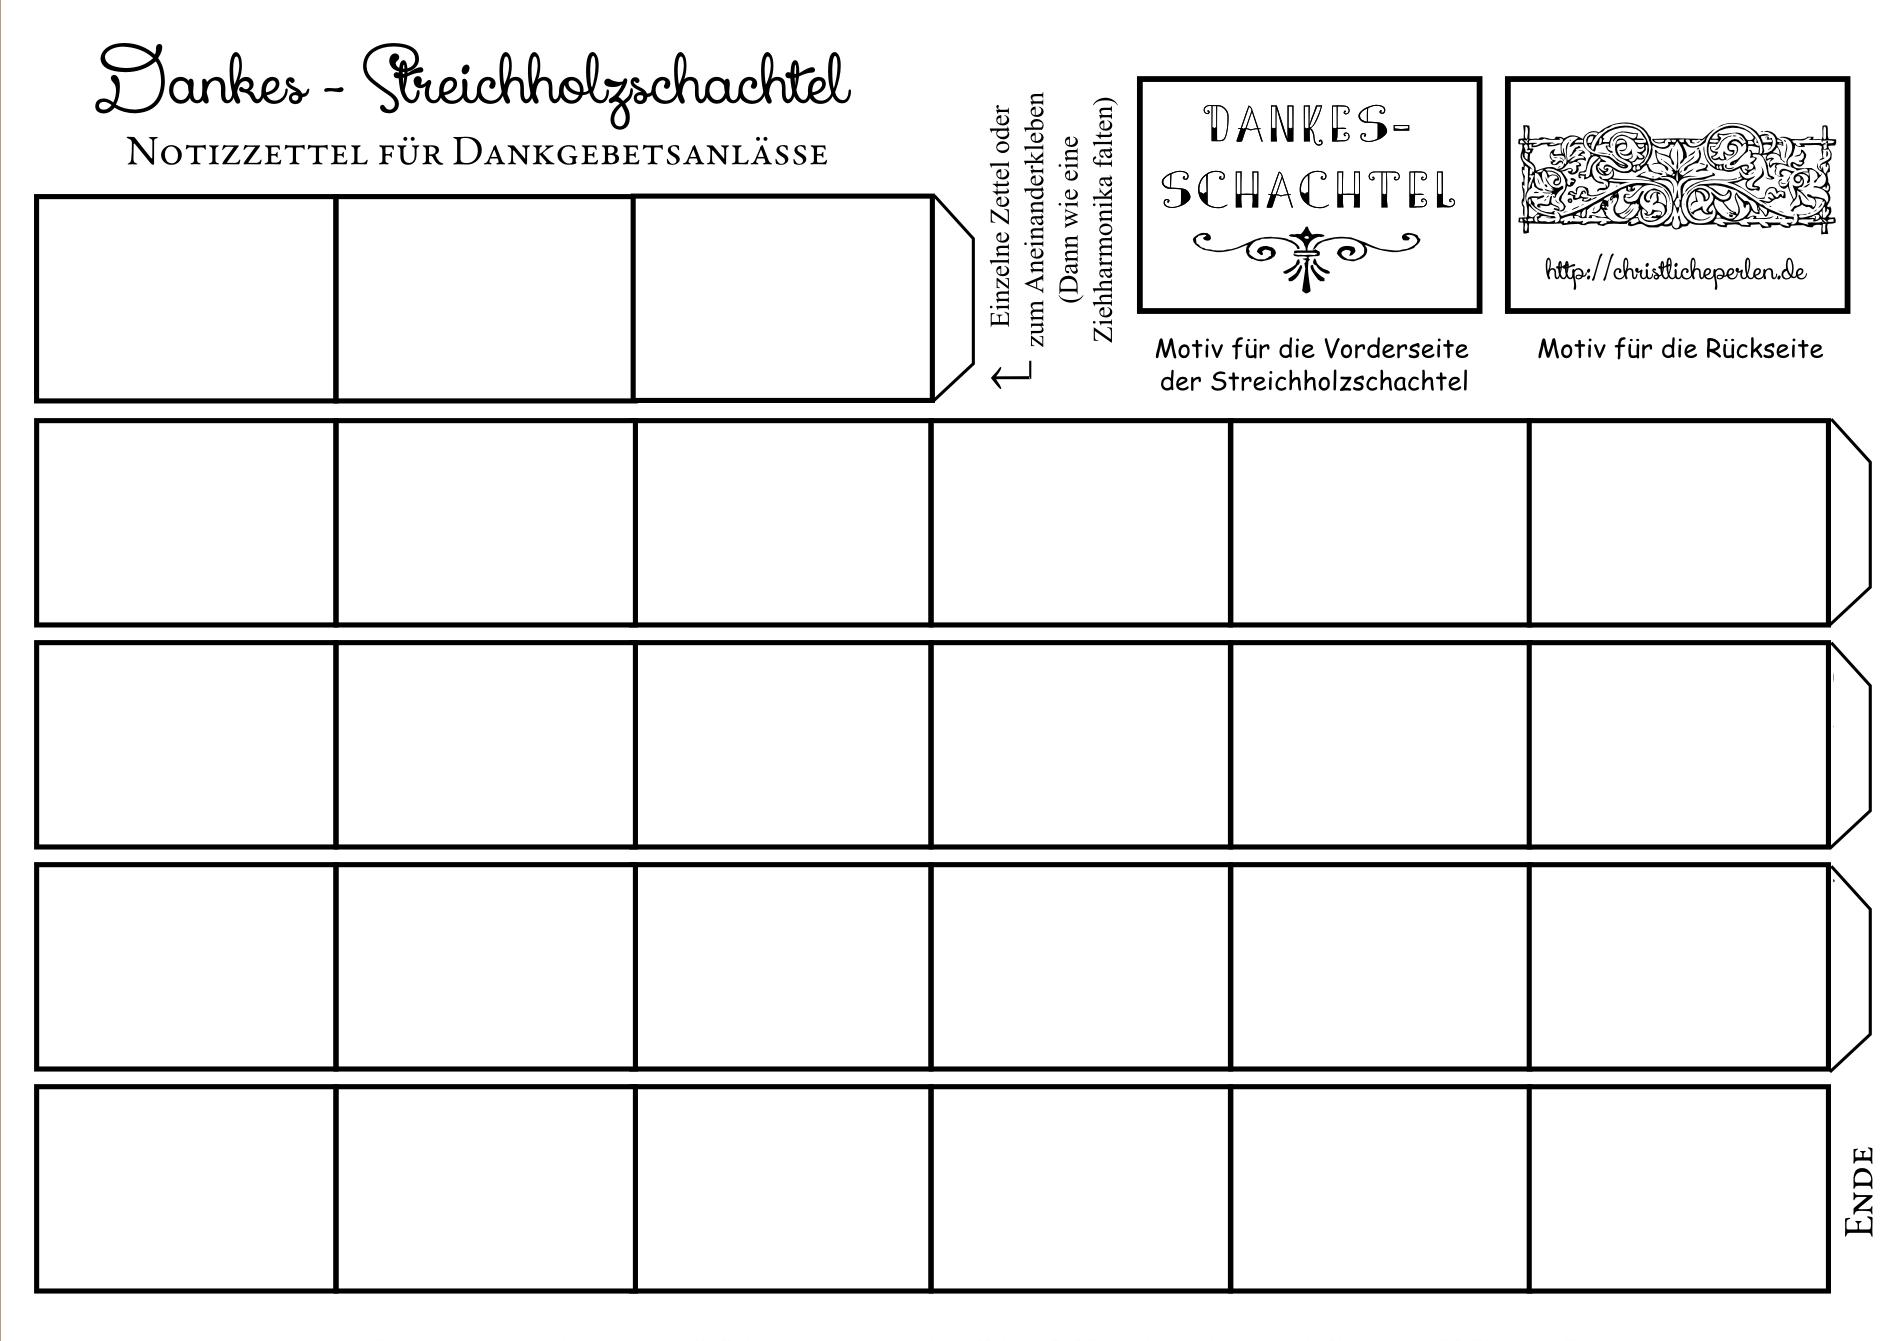 Worksheet Crafter Gratis Printable Worksheets And Activities For Teachers Parents Tutors And Homeschool Families